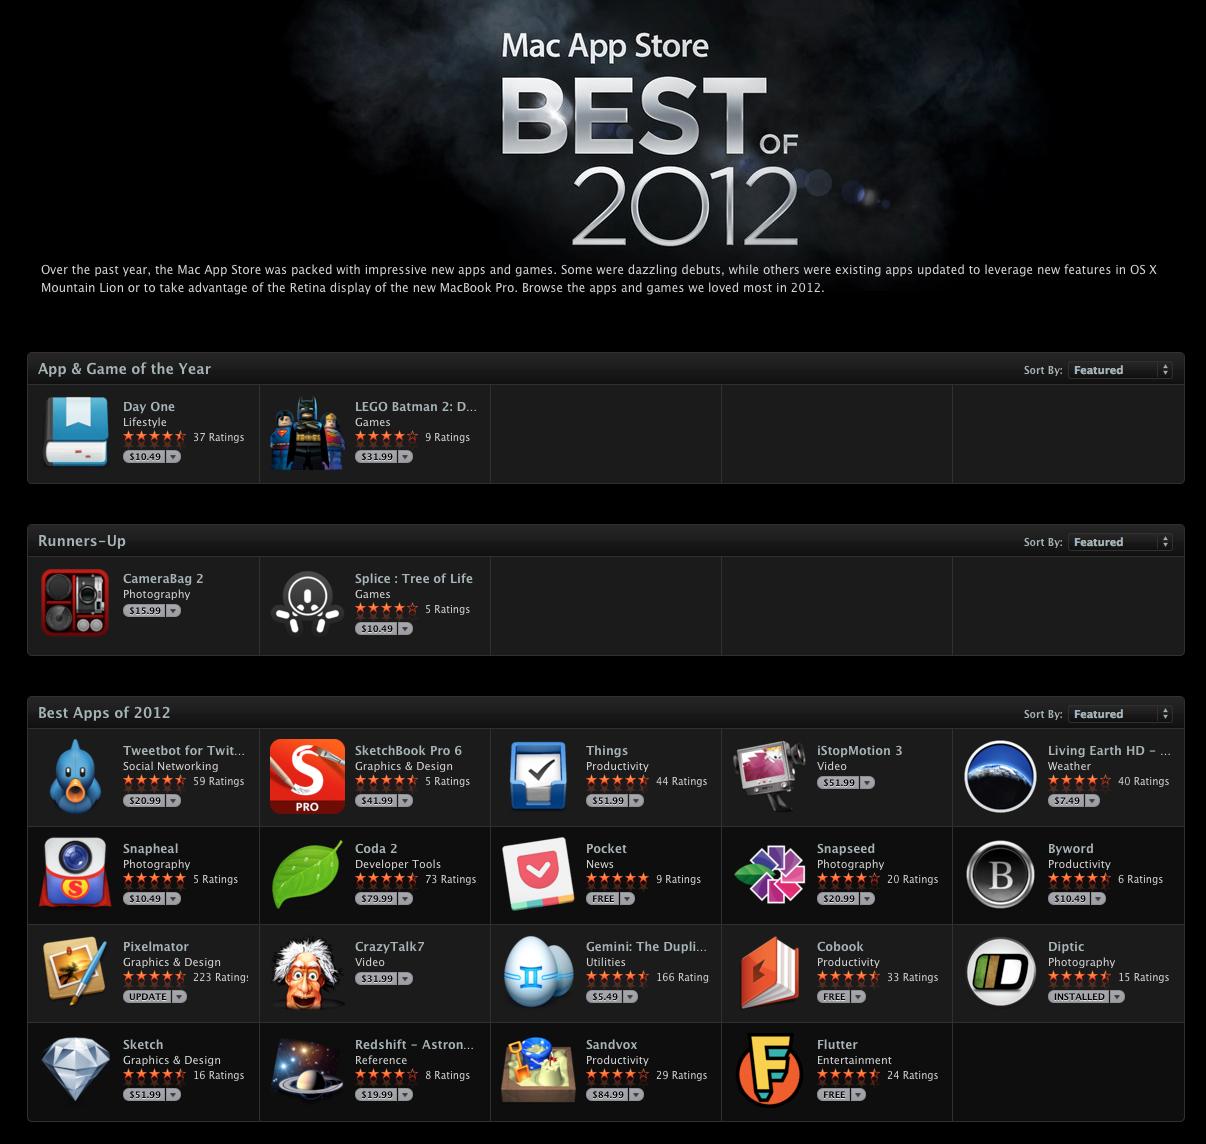 Mac App Store Best of 2012